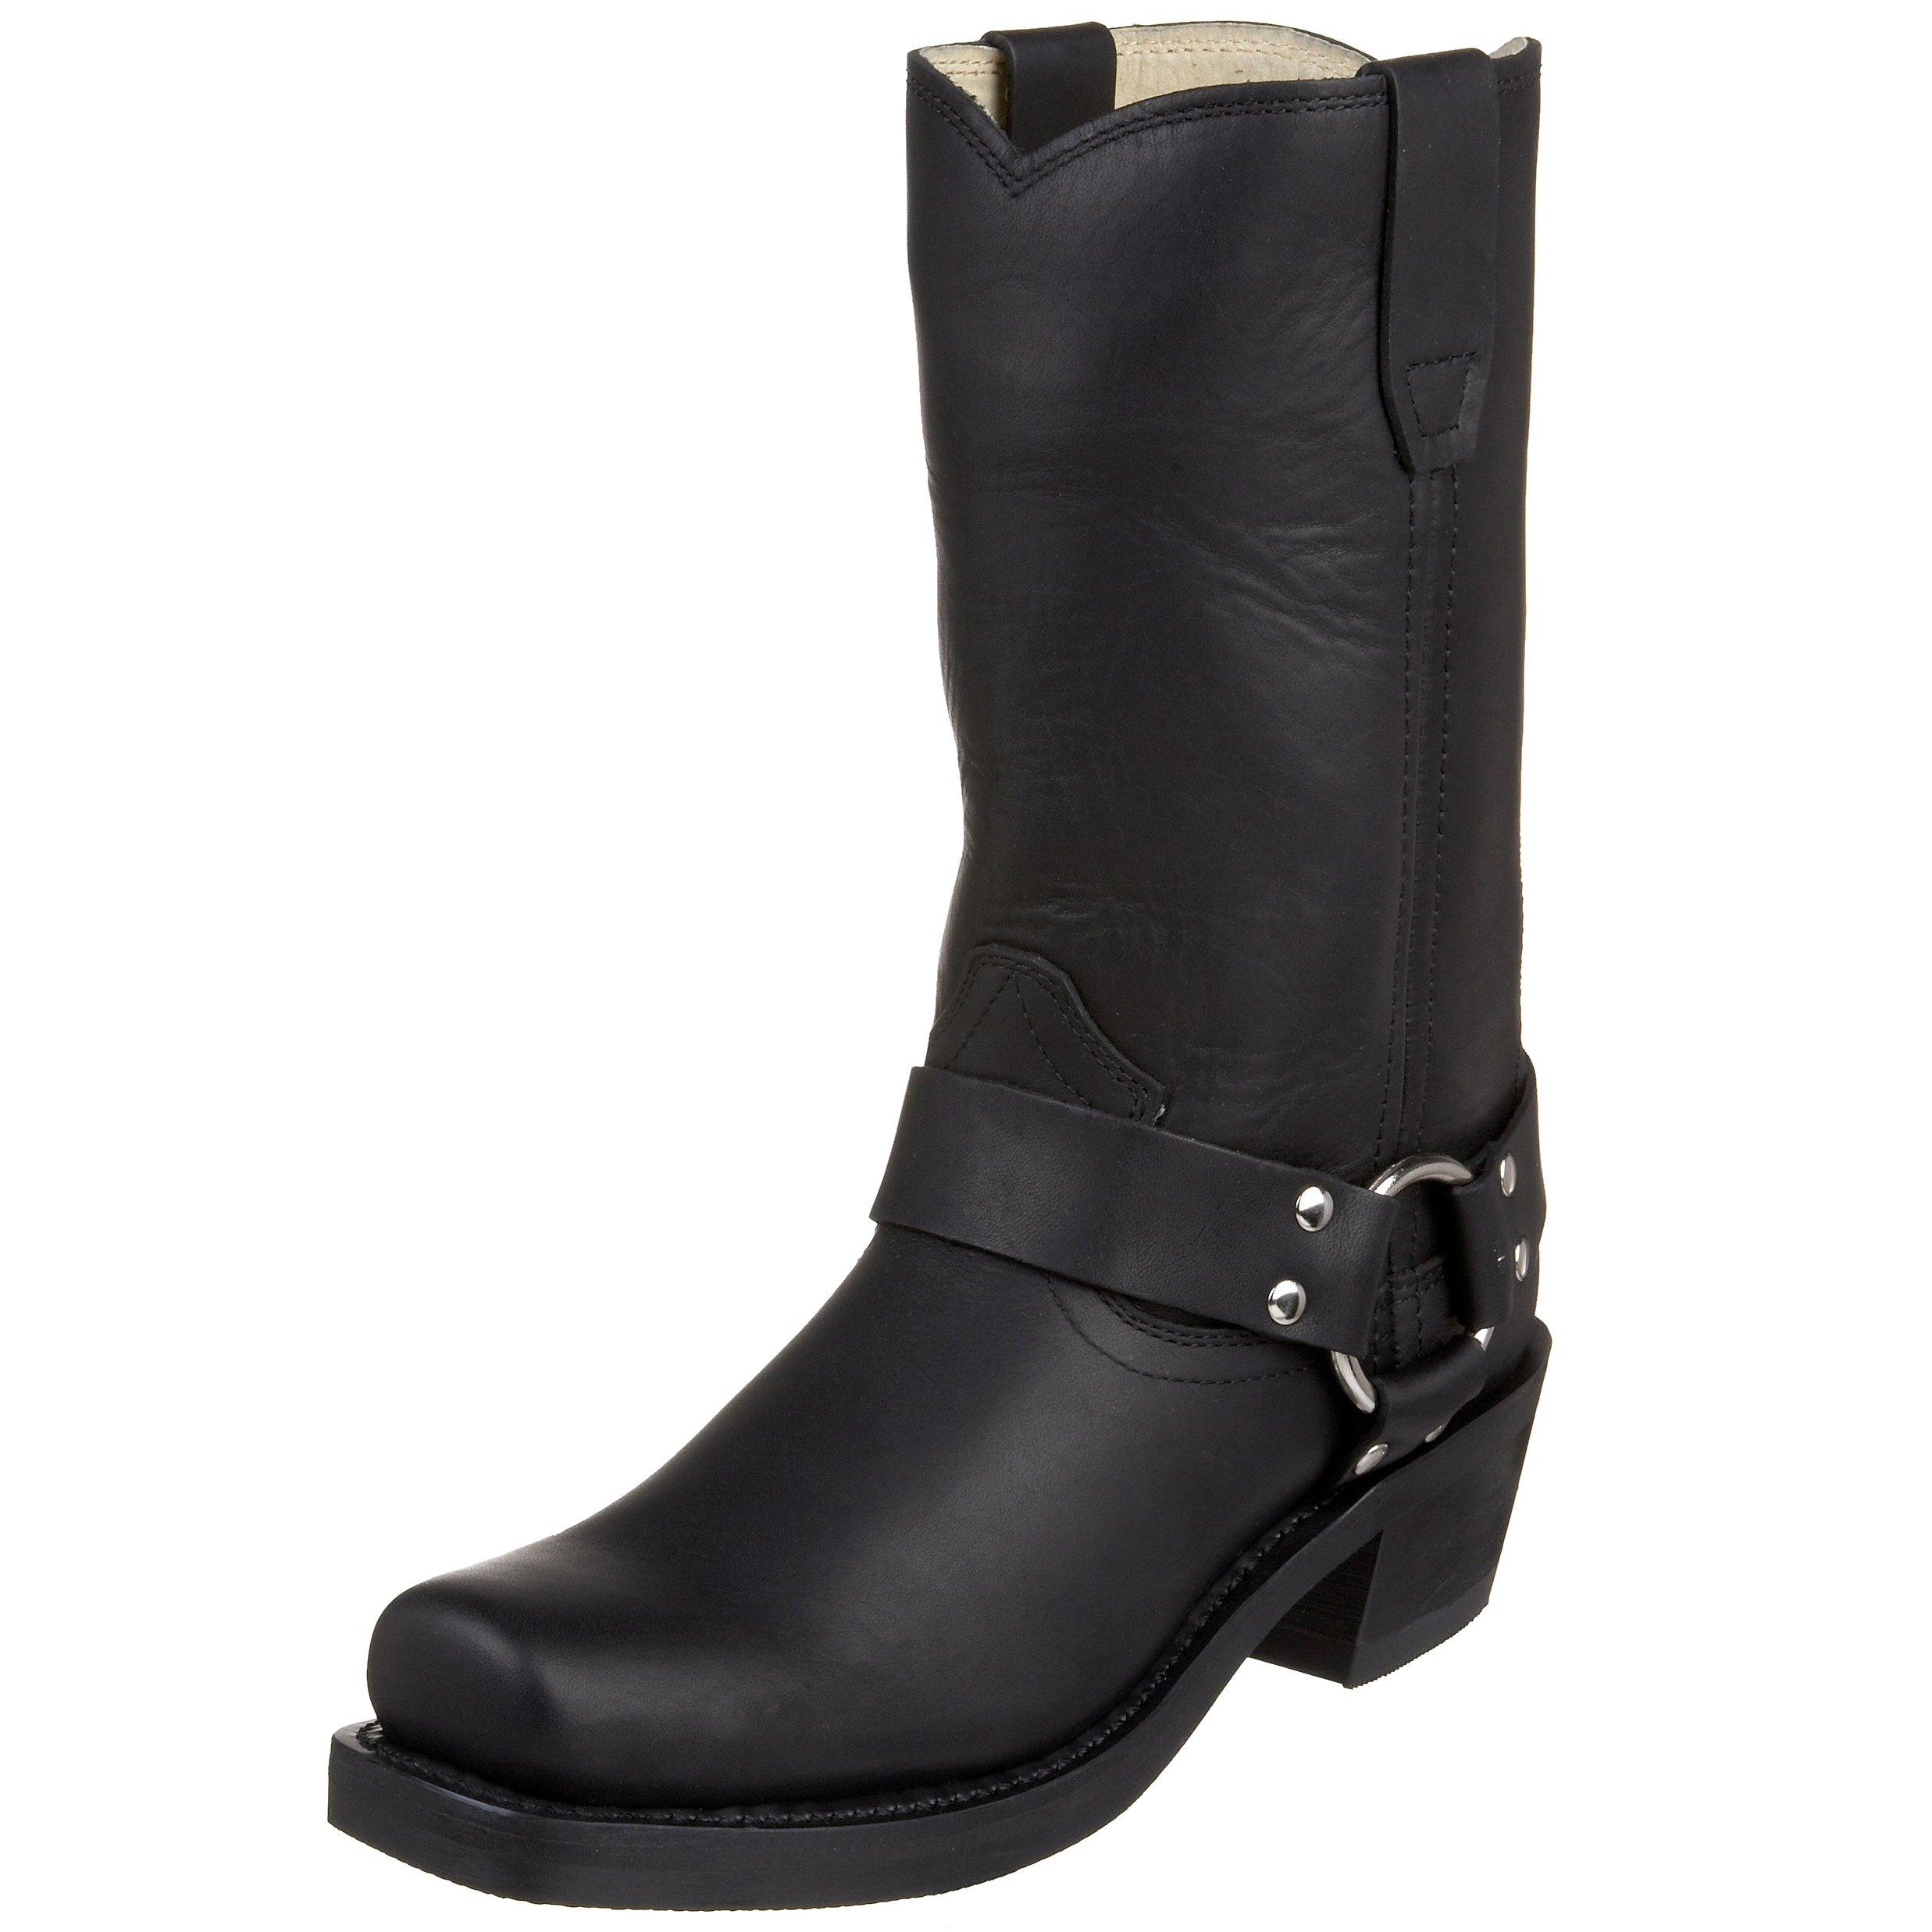 Durango Women's RD510 10'' Crossroads Harness Boot,Black,8 M US